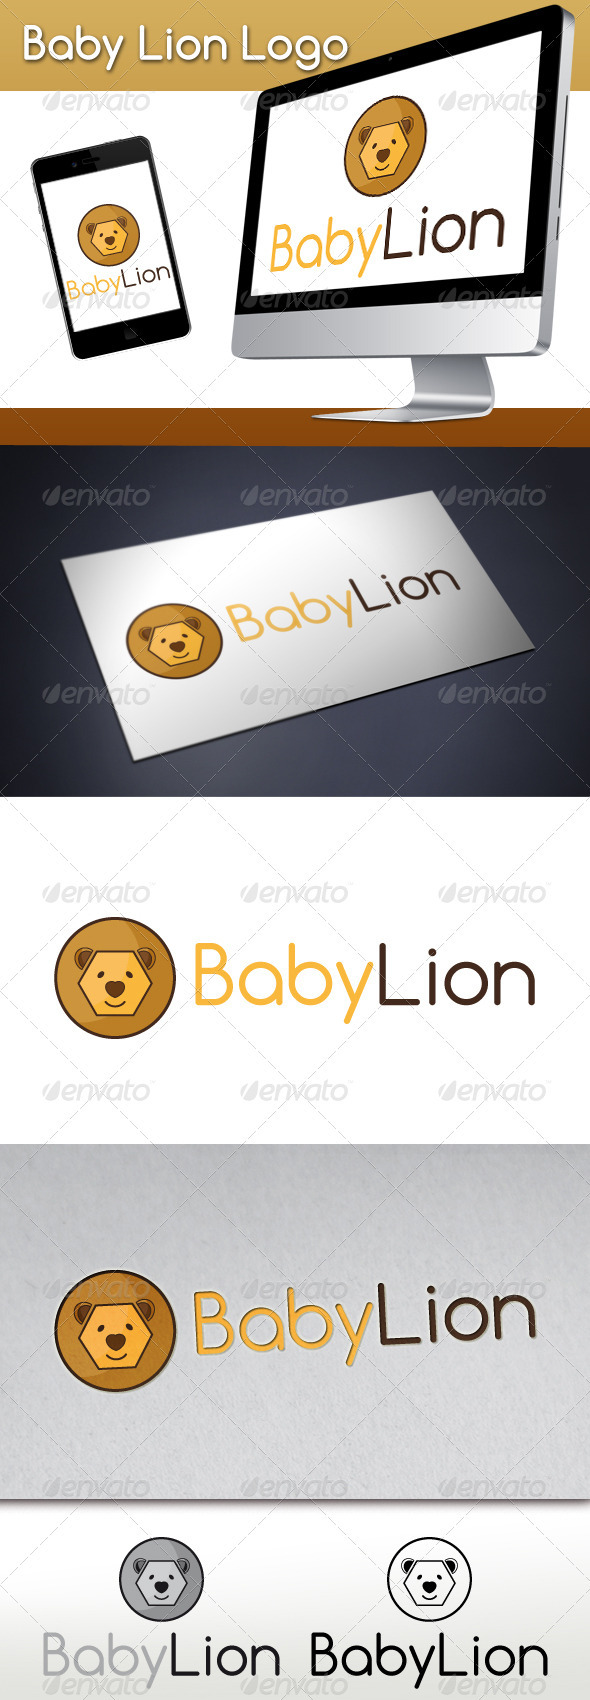 GraphicRiver Baby Lion Logo 3285964